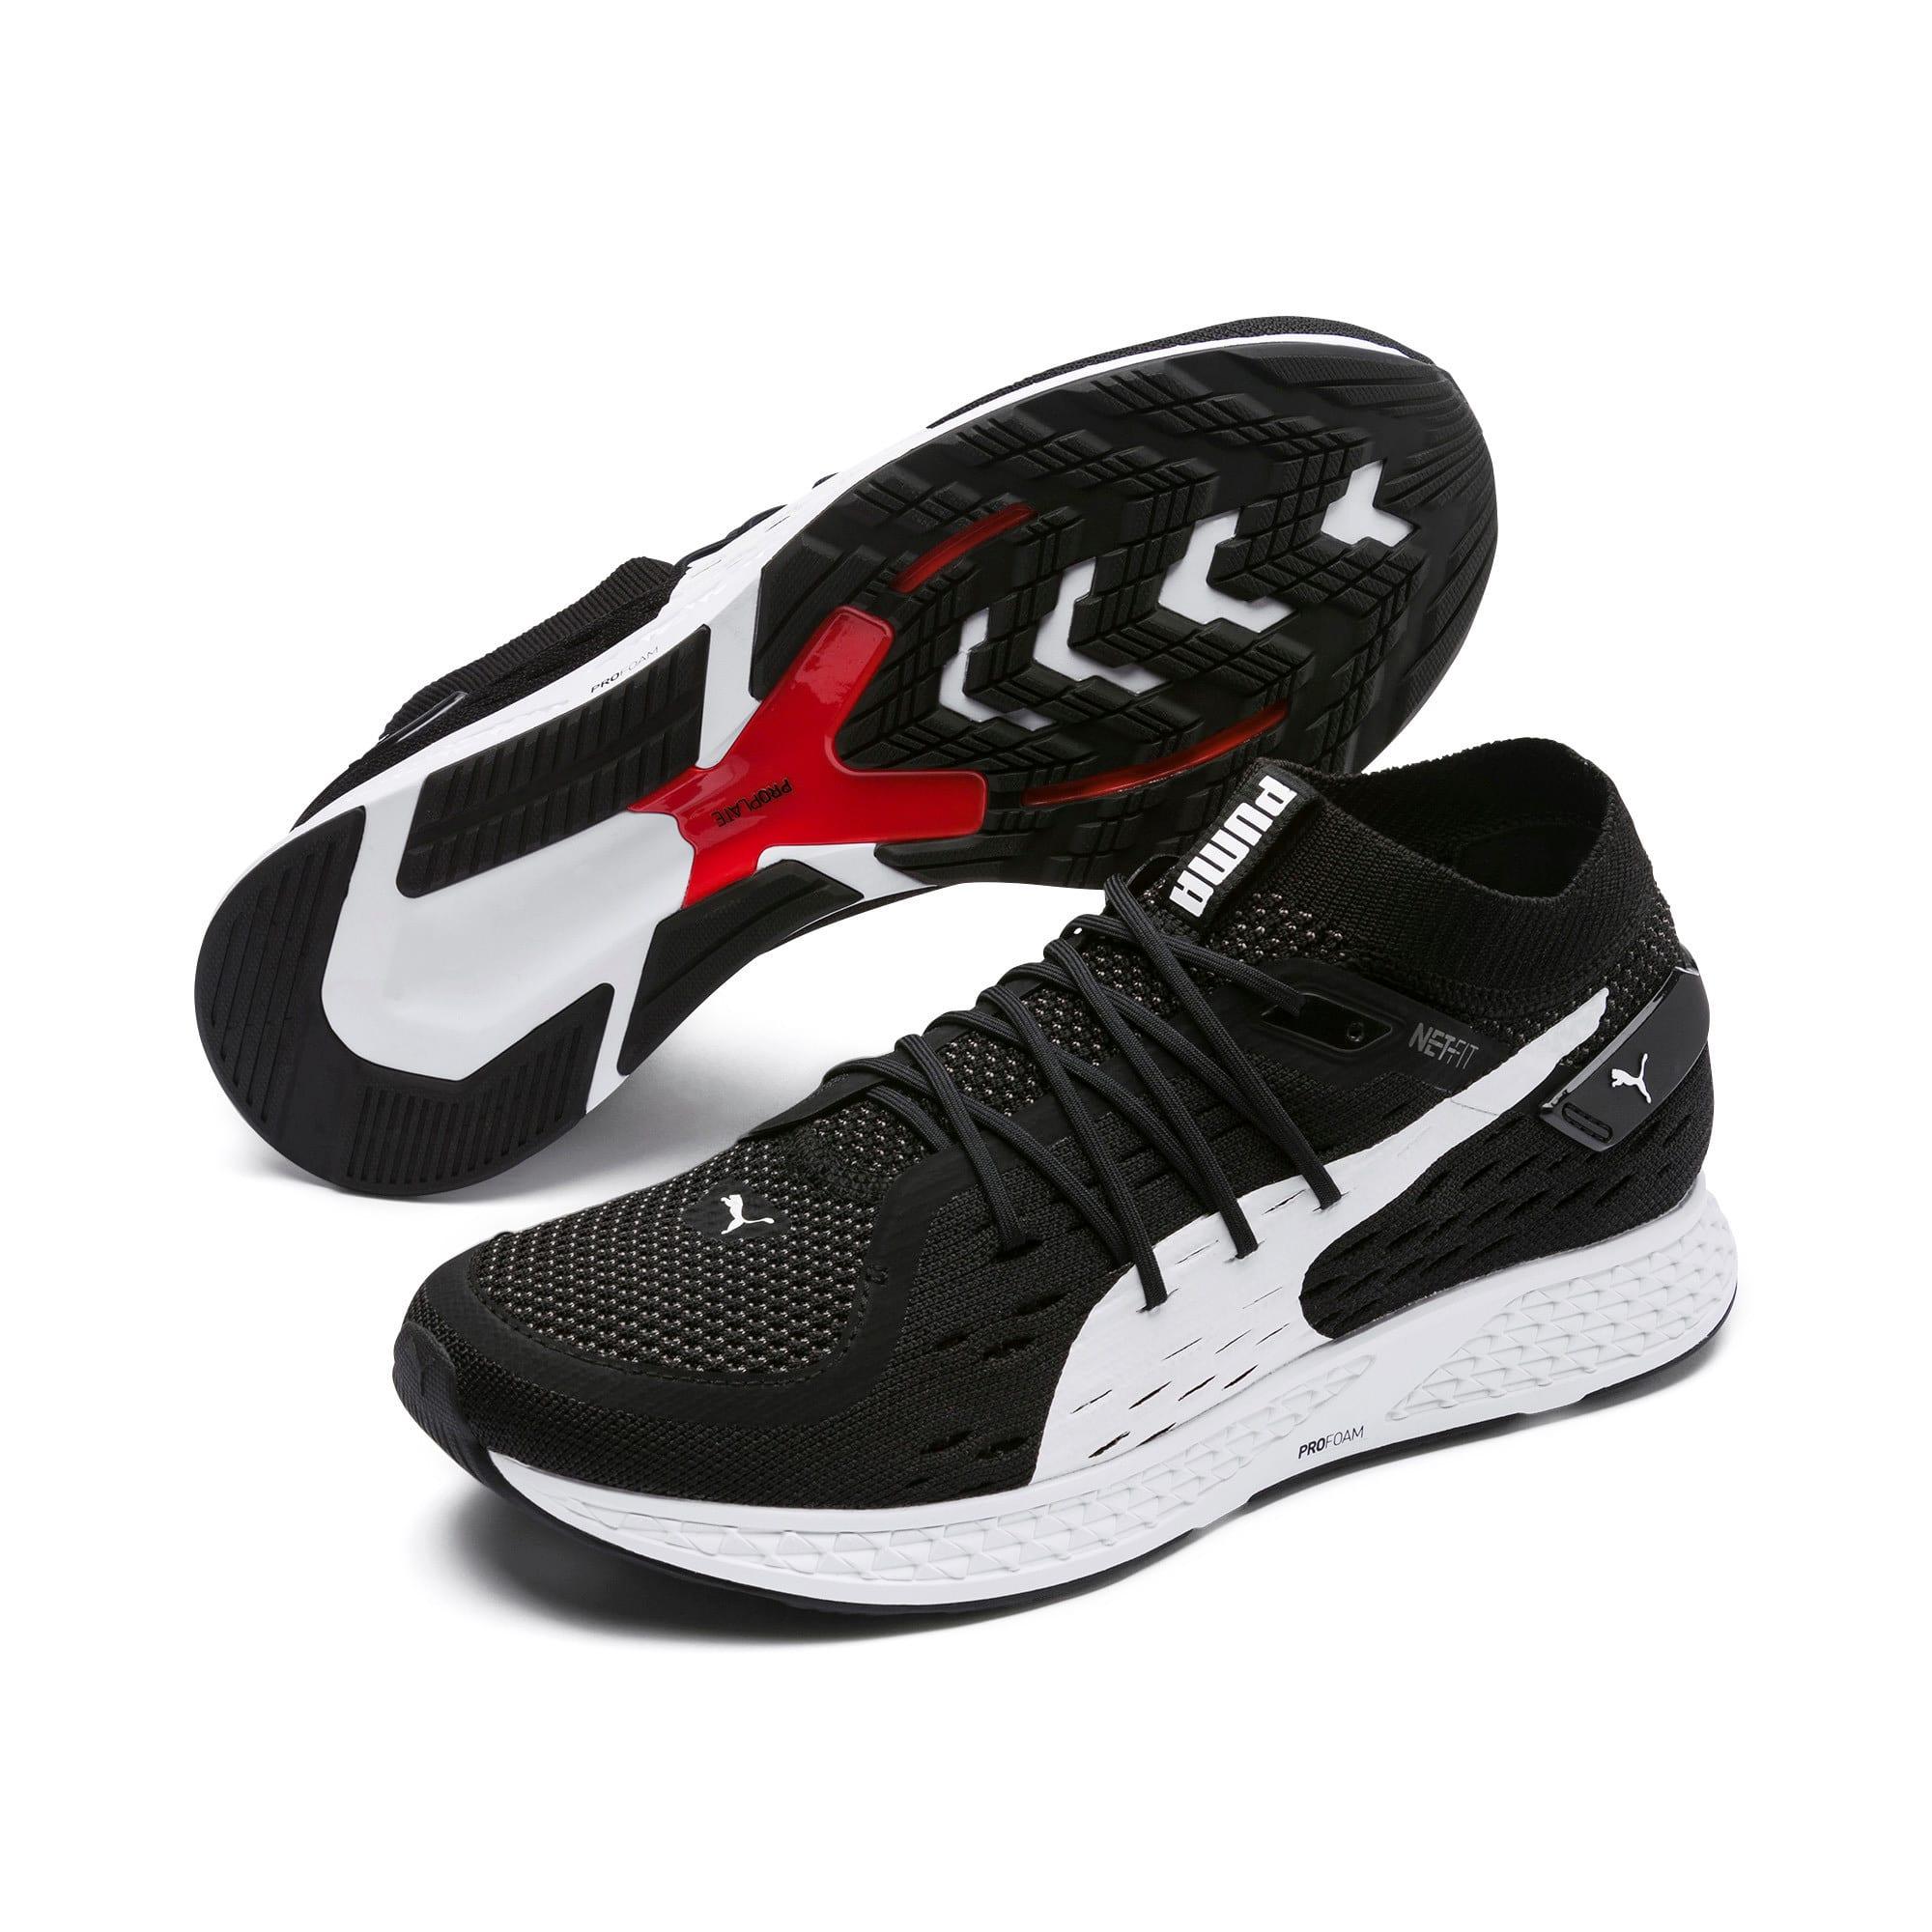 Thumbnail 3 of SPEED 500 Men's Running Shoes, Puma Black-Puma White, medium